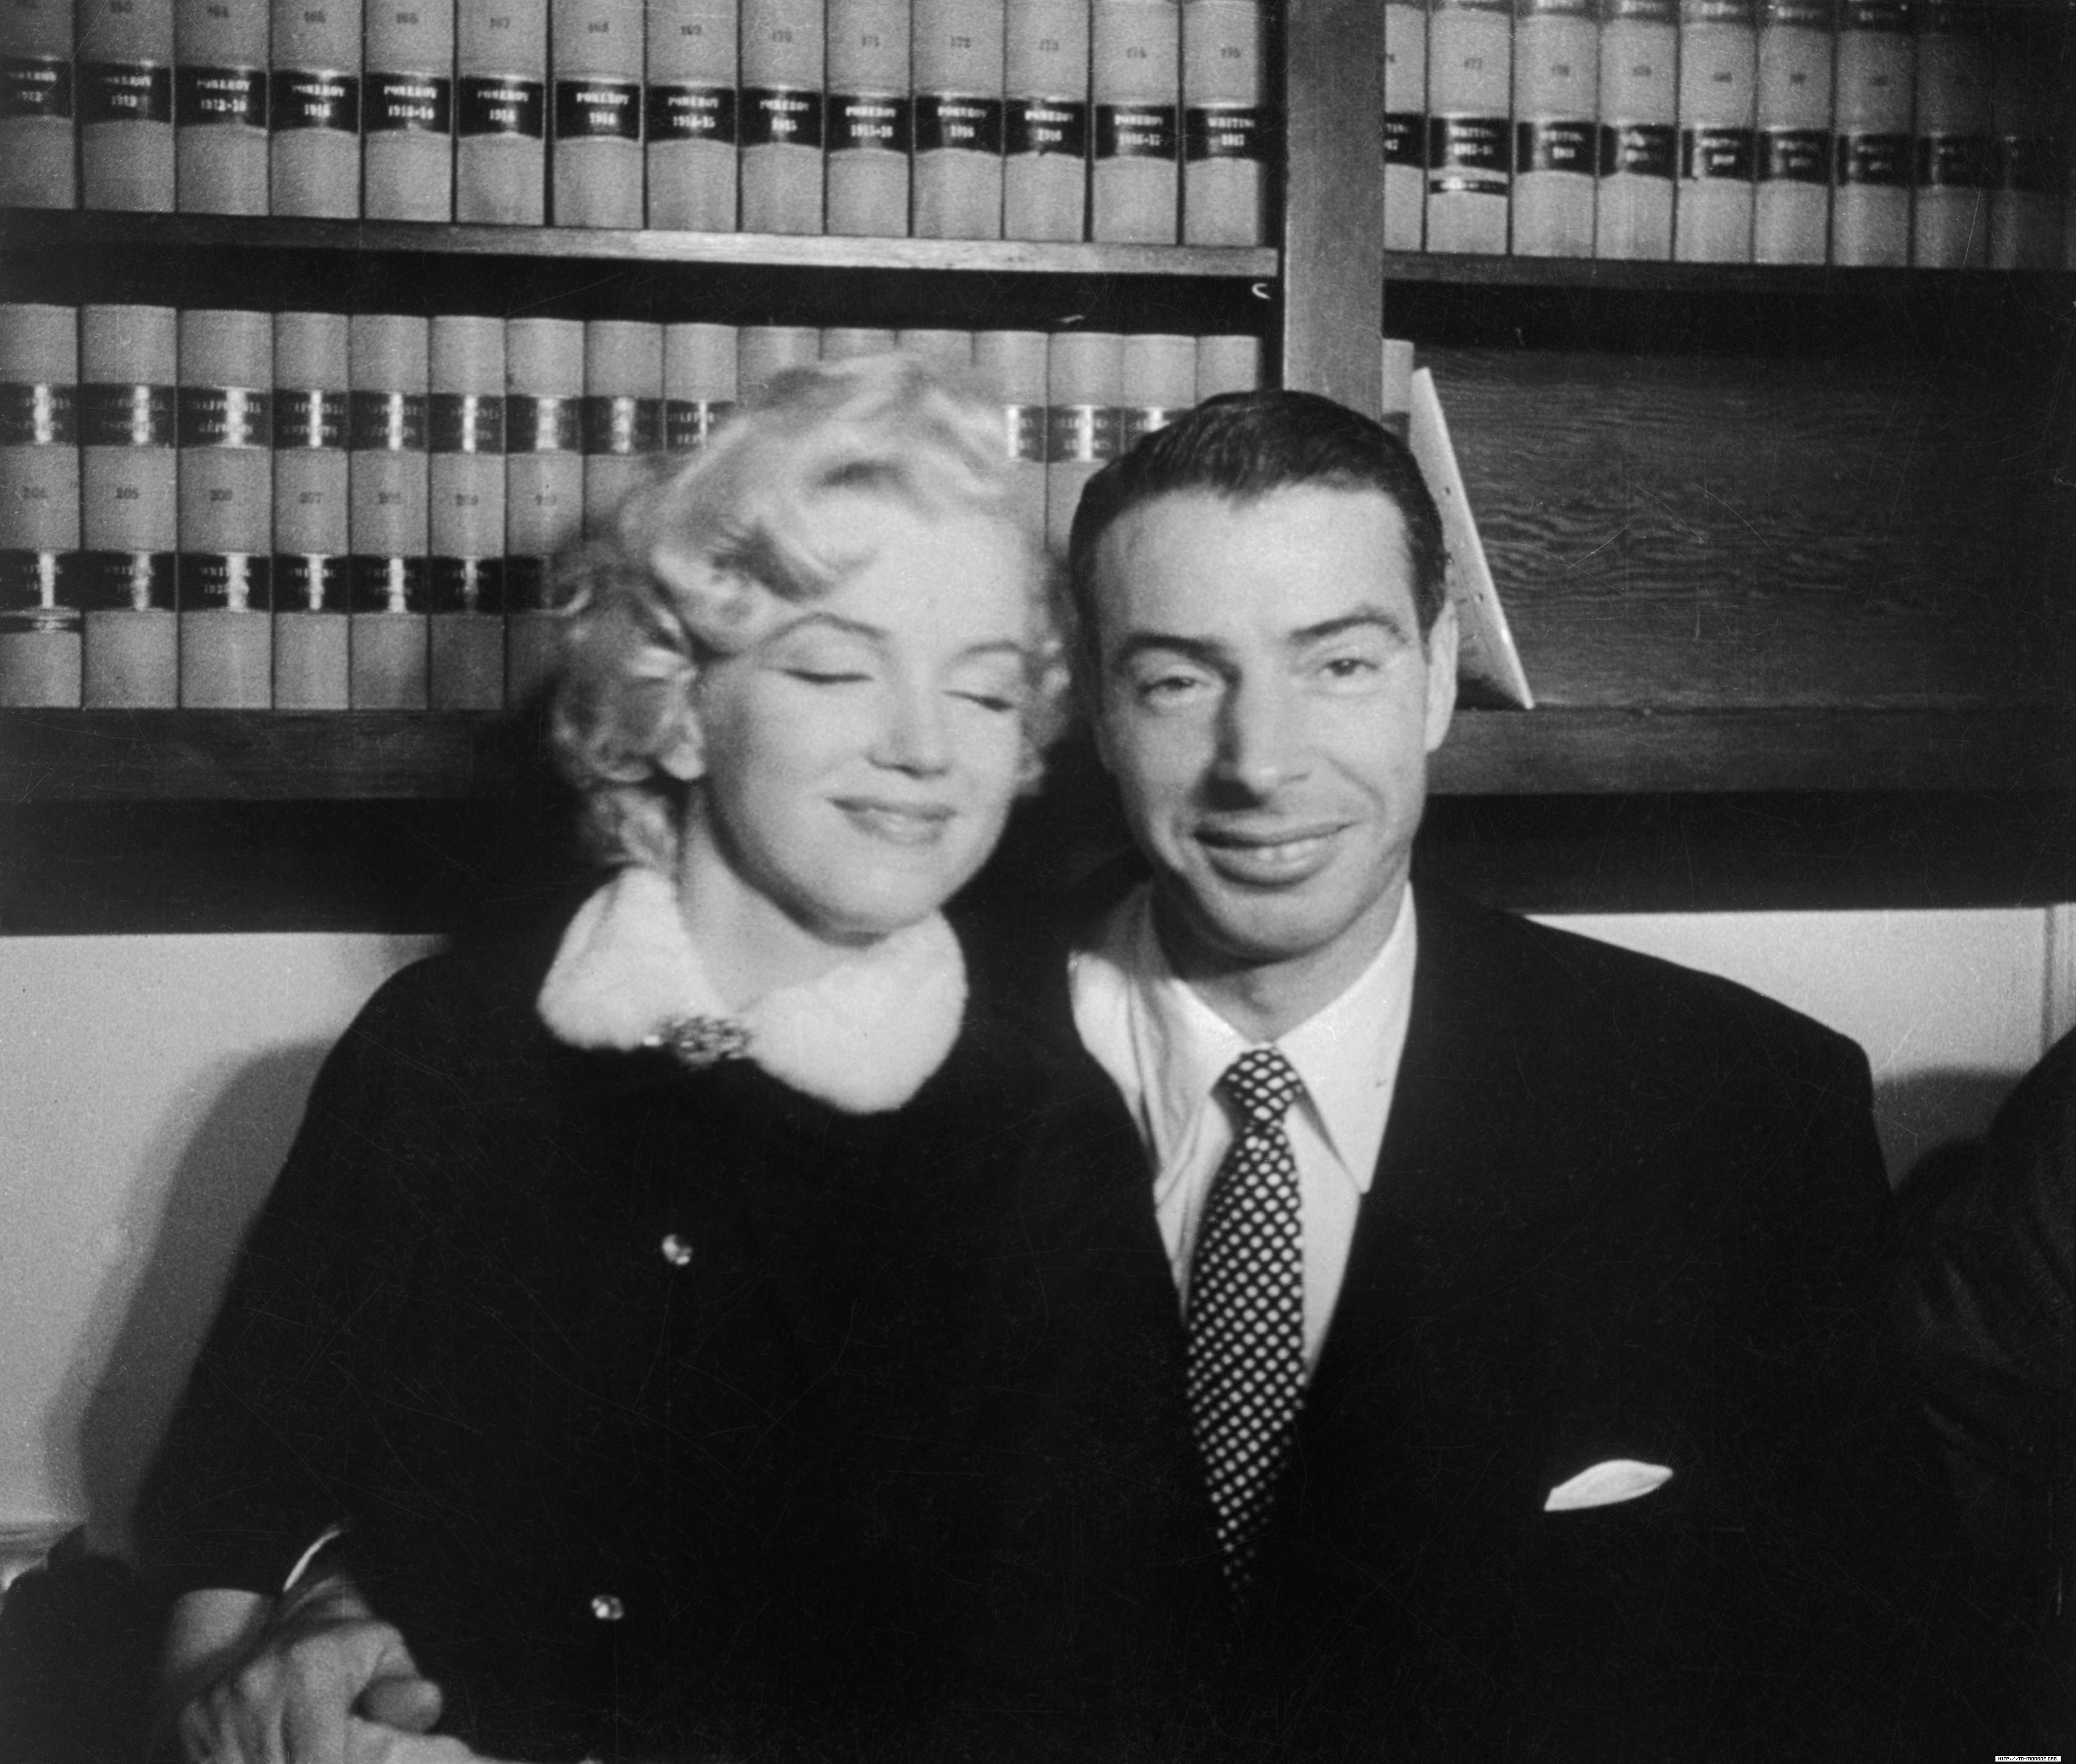 Marilyn Joe Dimaggio Wedding In January Of 1954